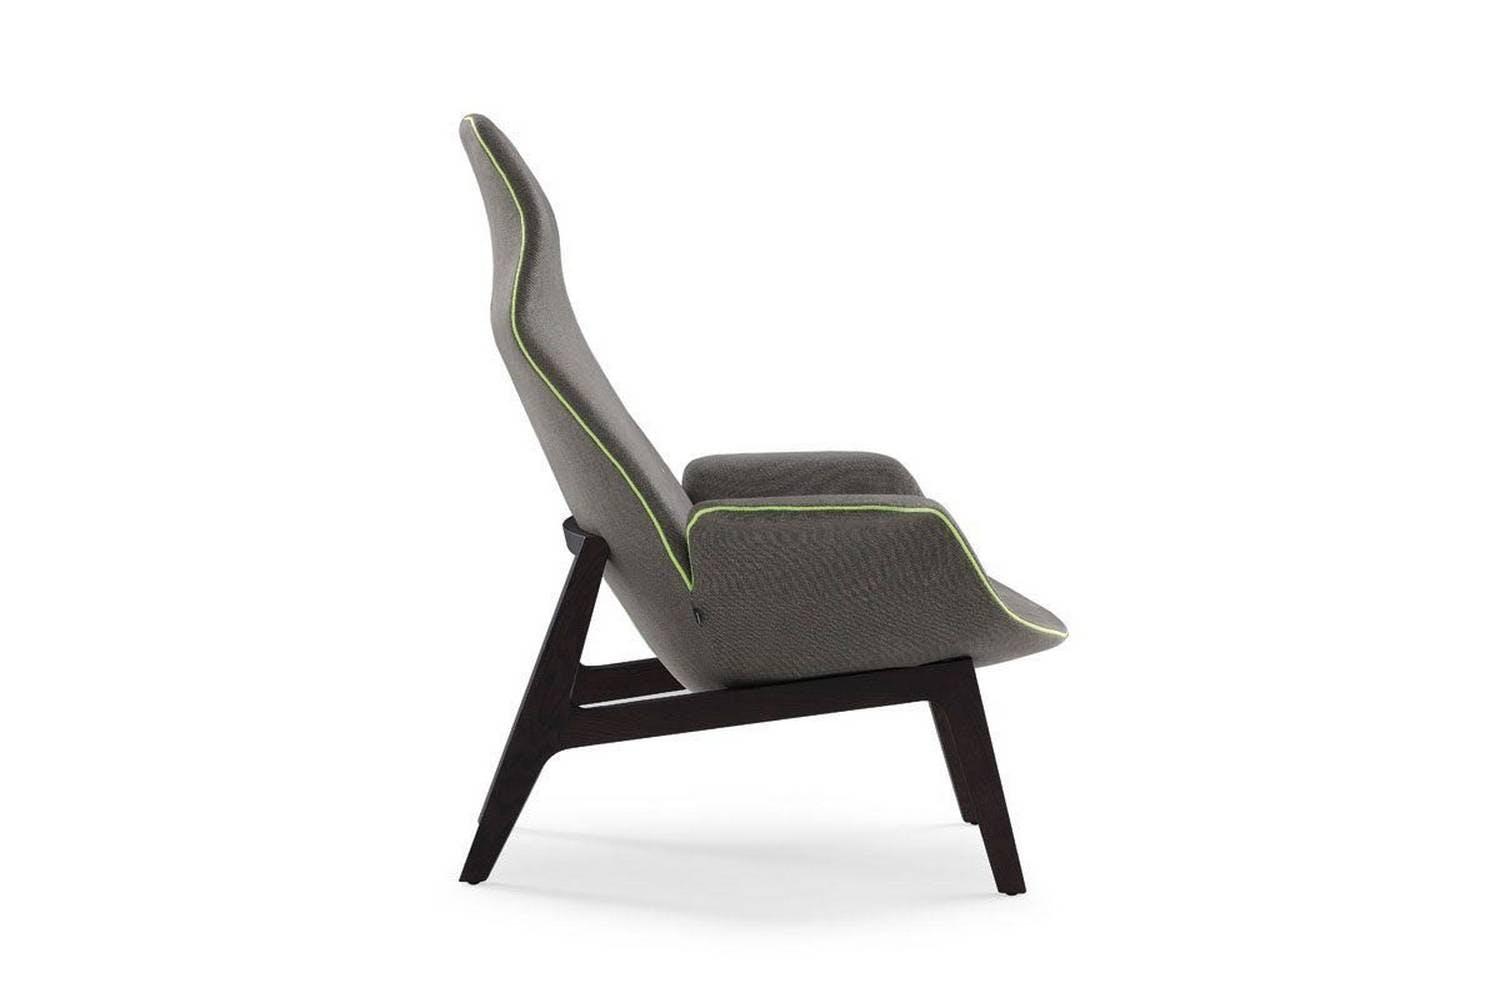 Peachy Ventura Lounge Armchair By J M Massaud For Poliform Ibusinesslaw Wood Chair Design Ideas Ibusinesslaworg